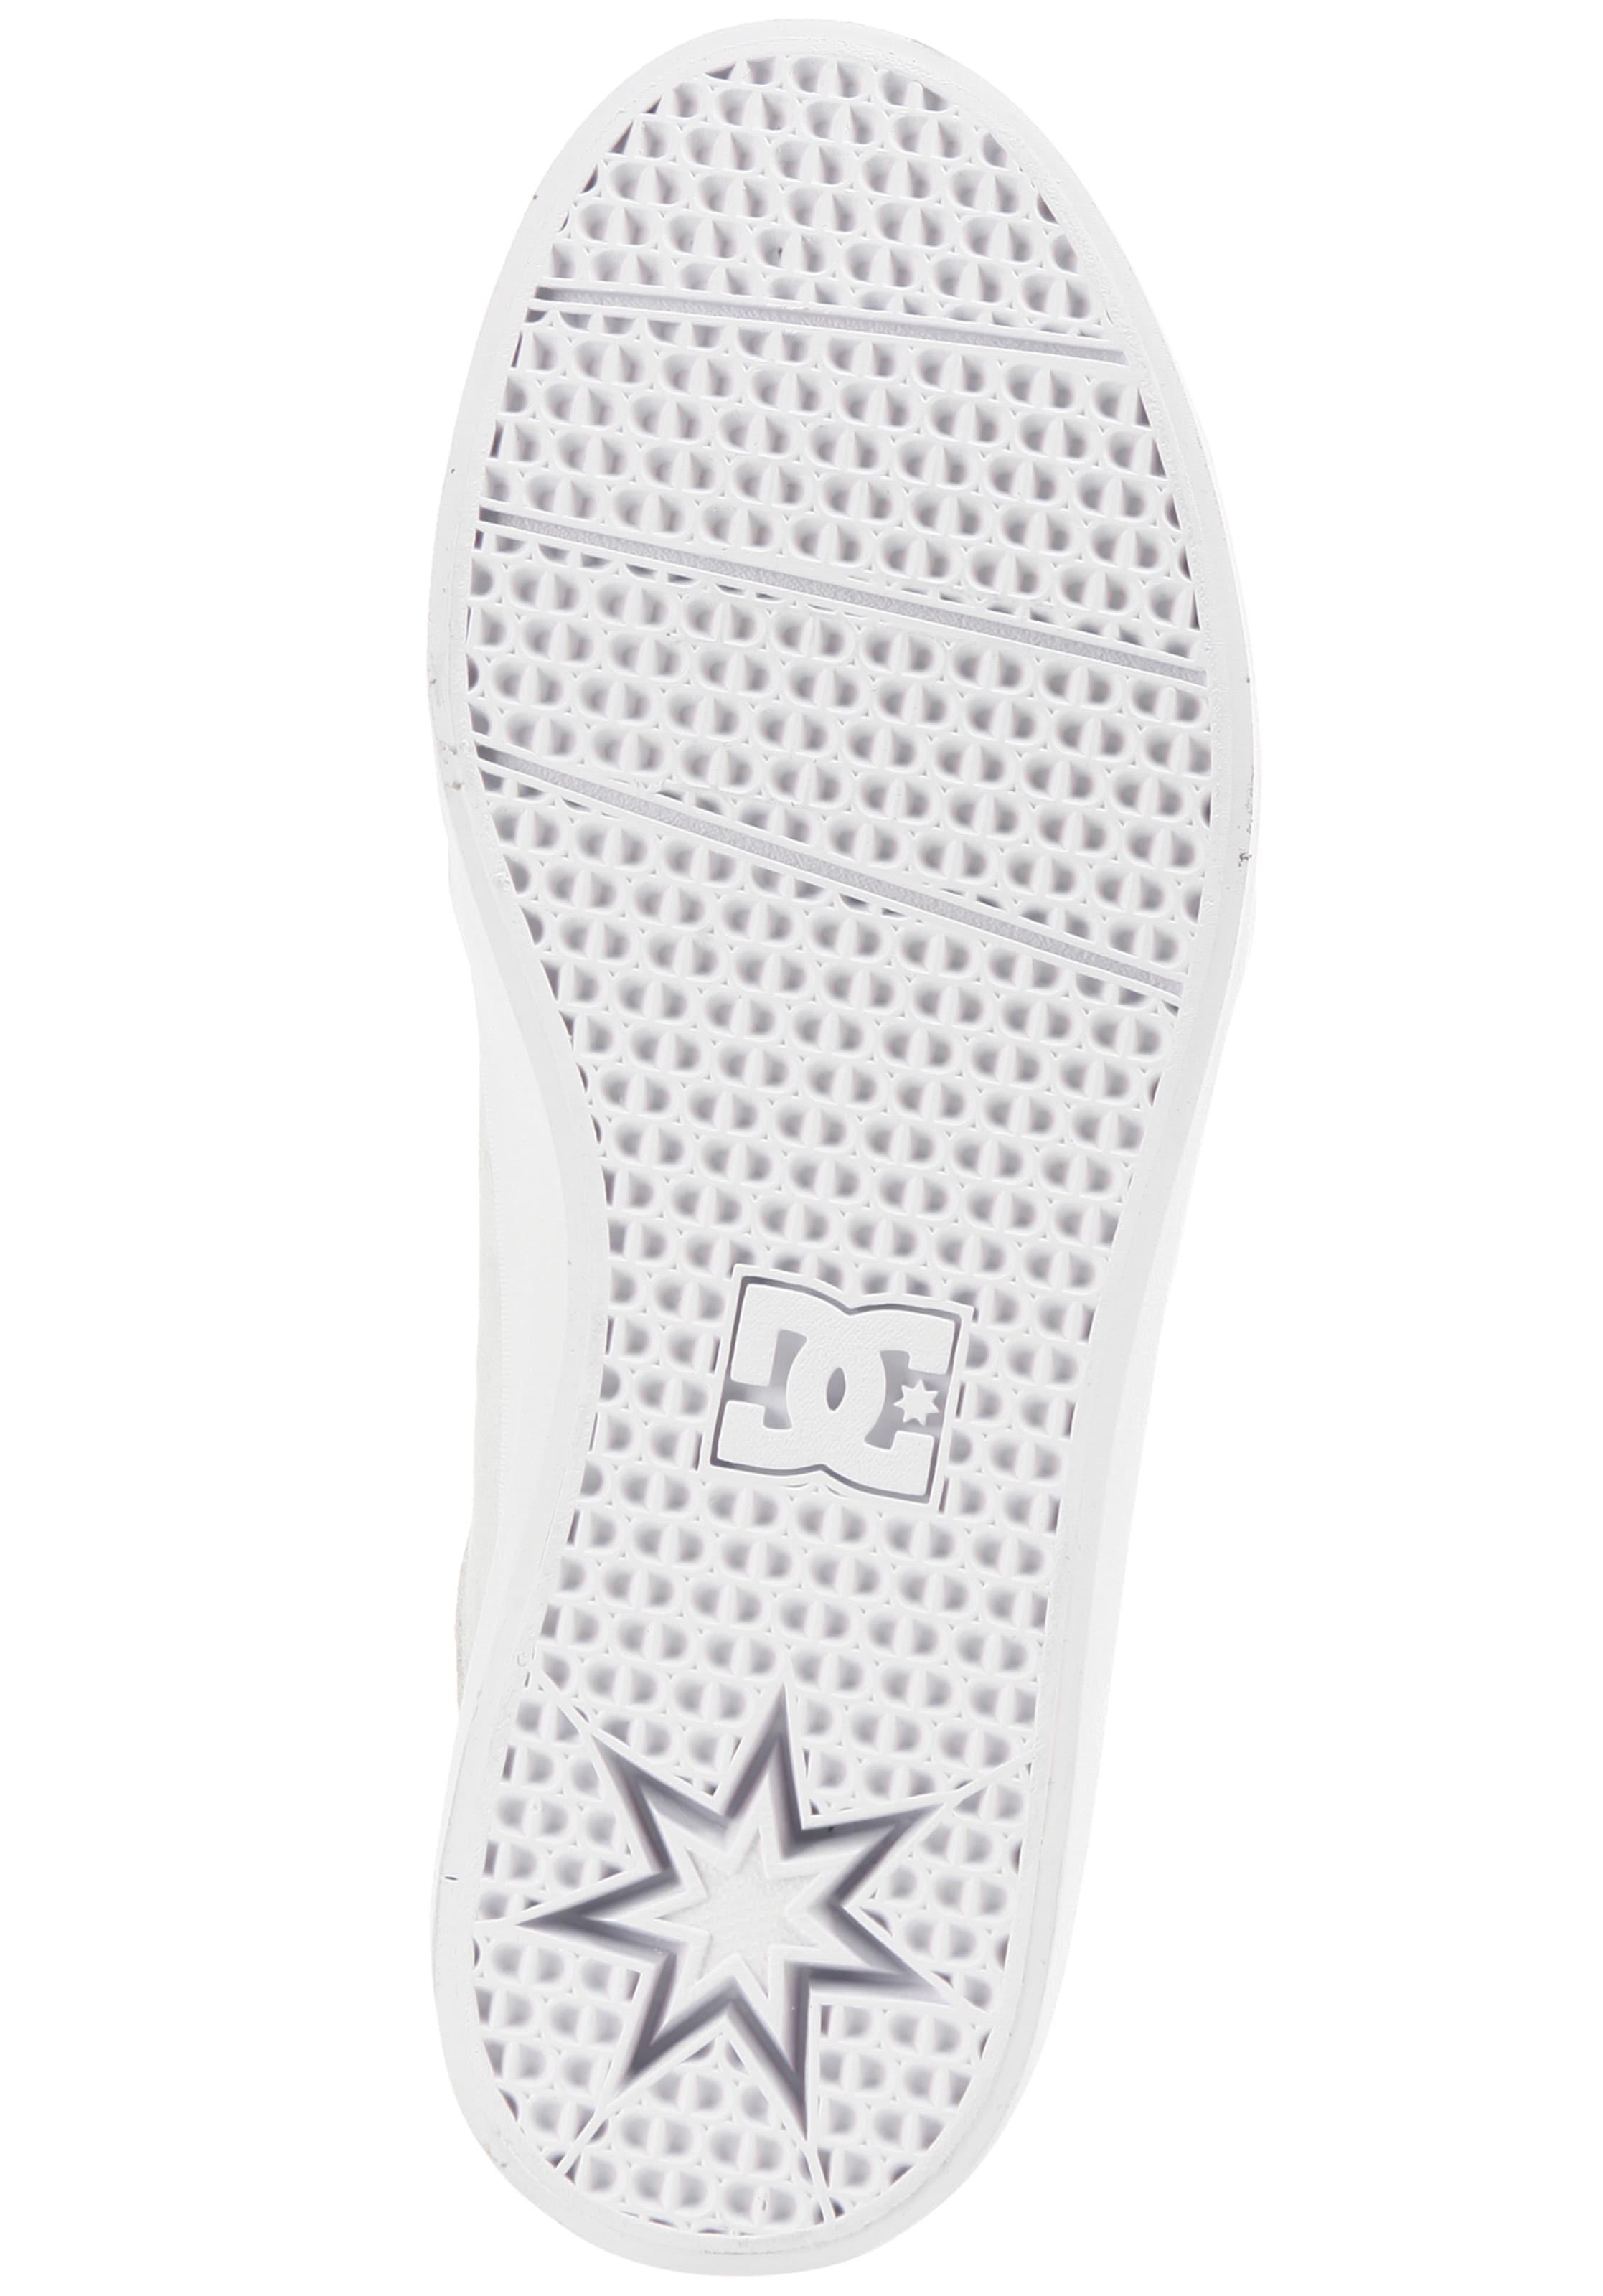 In Dc Sneaker Platform Shoes 'trase Weiß Le' ZuiwOlPTkX